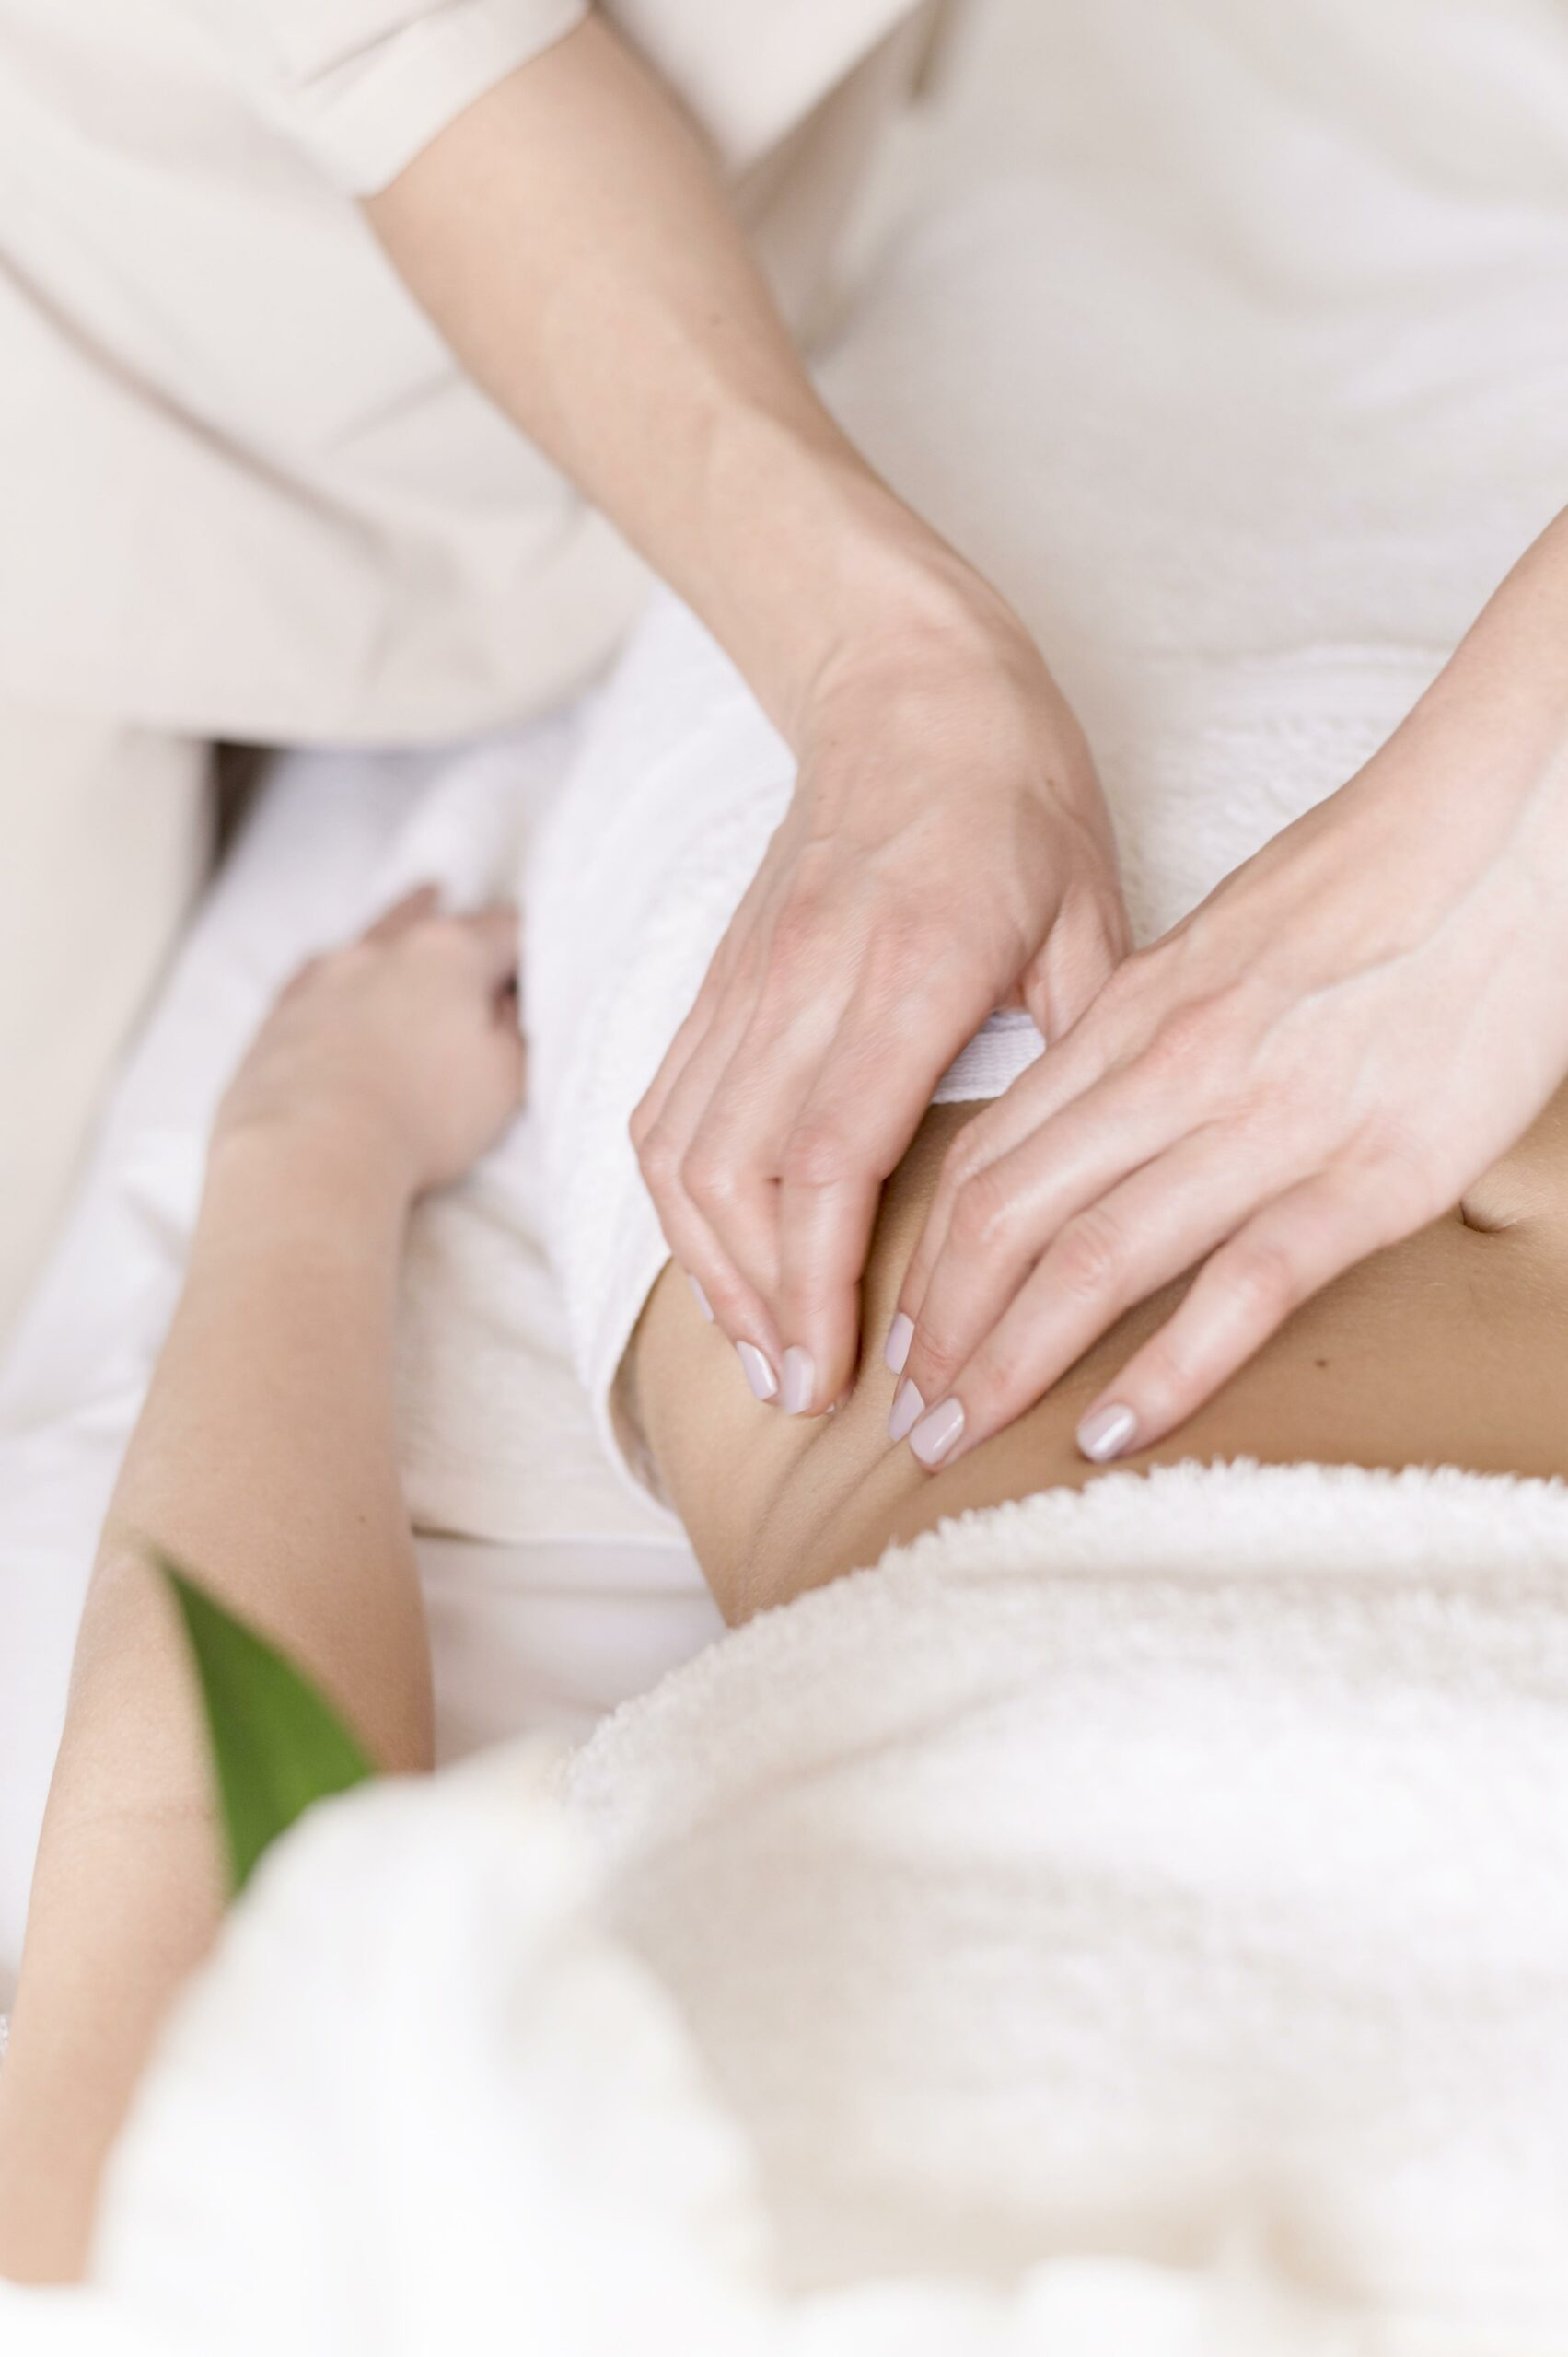 abdomen-massage-concept